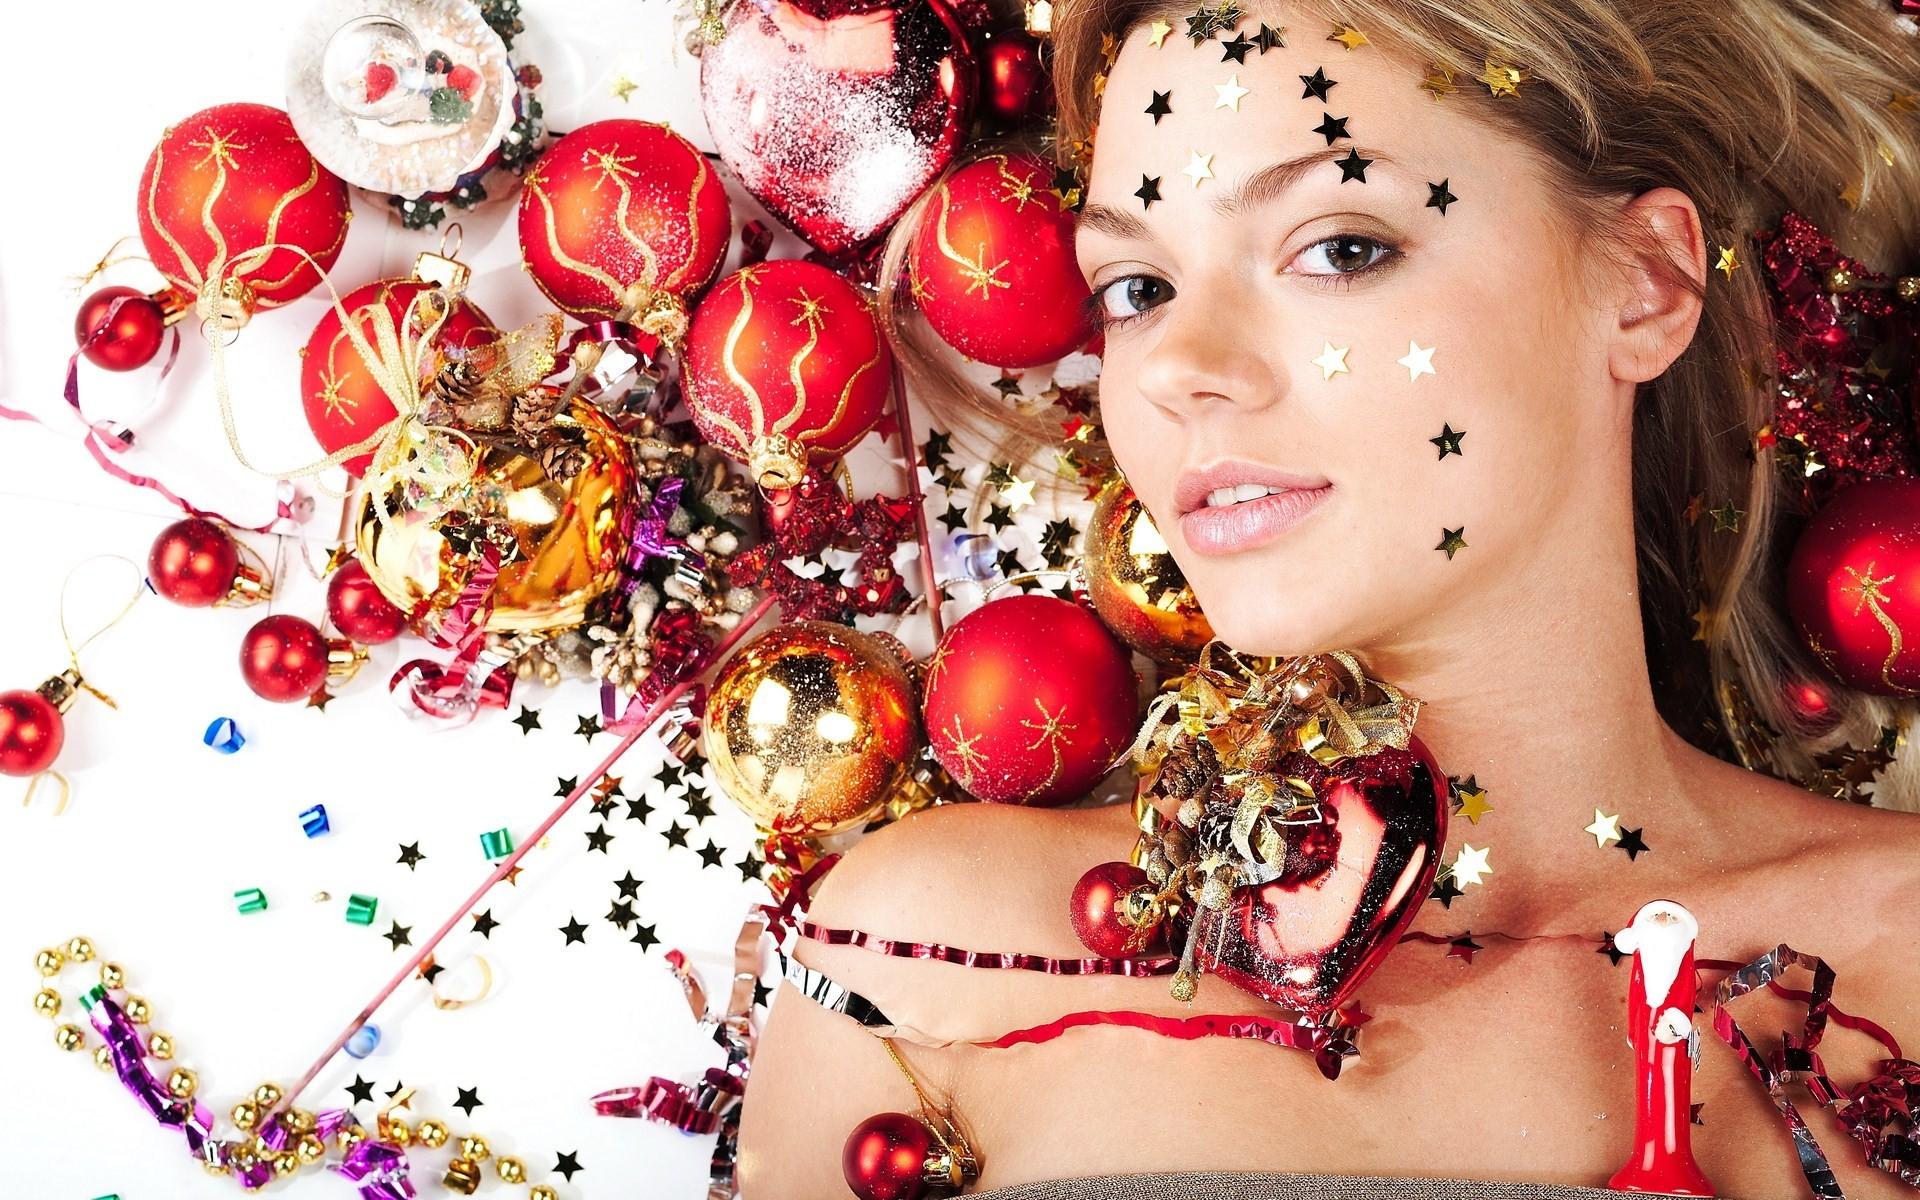 Christmas Girls Wallpapers 2016 - Wishespoint